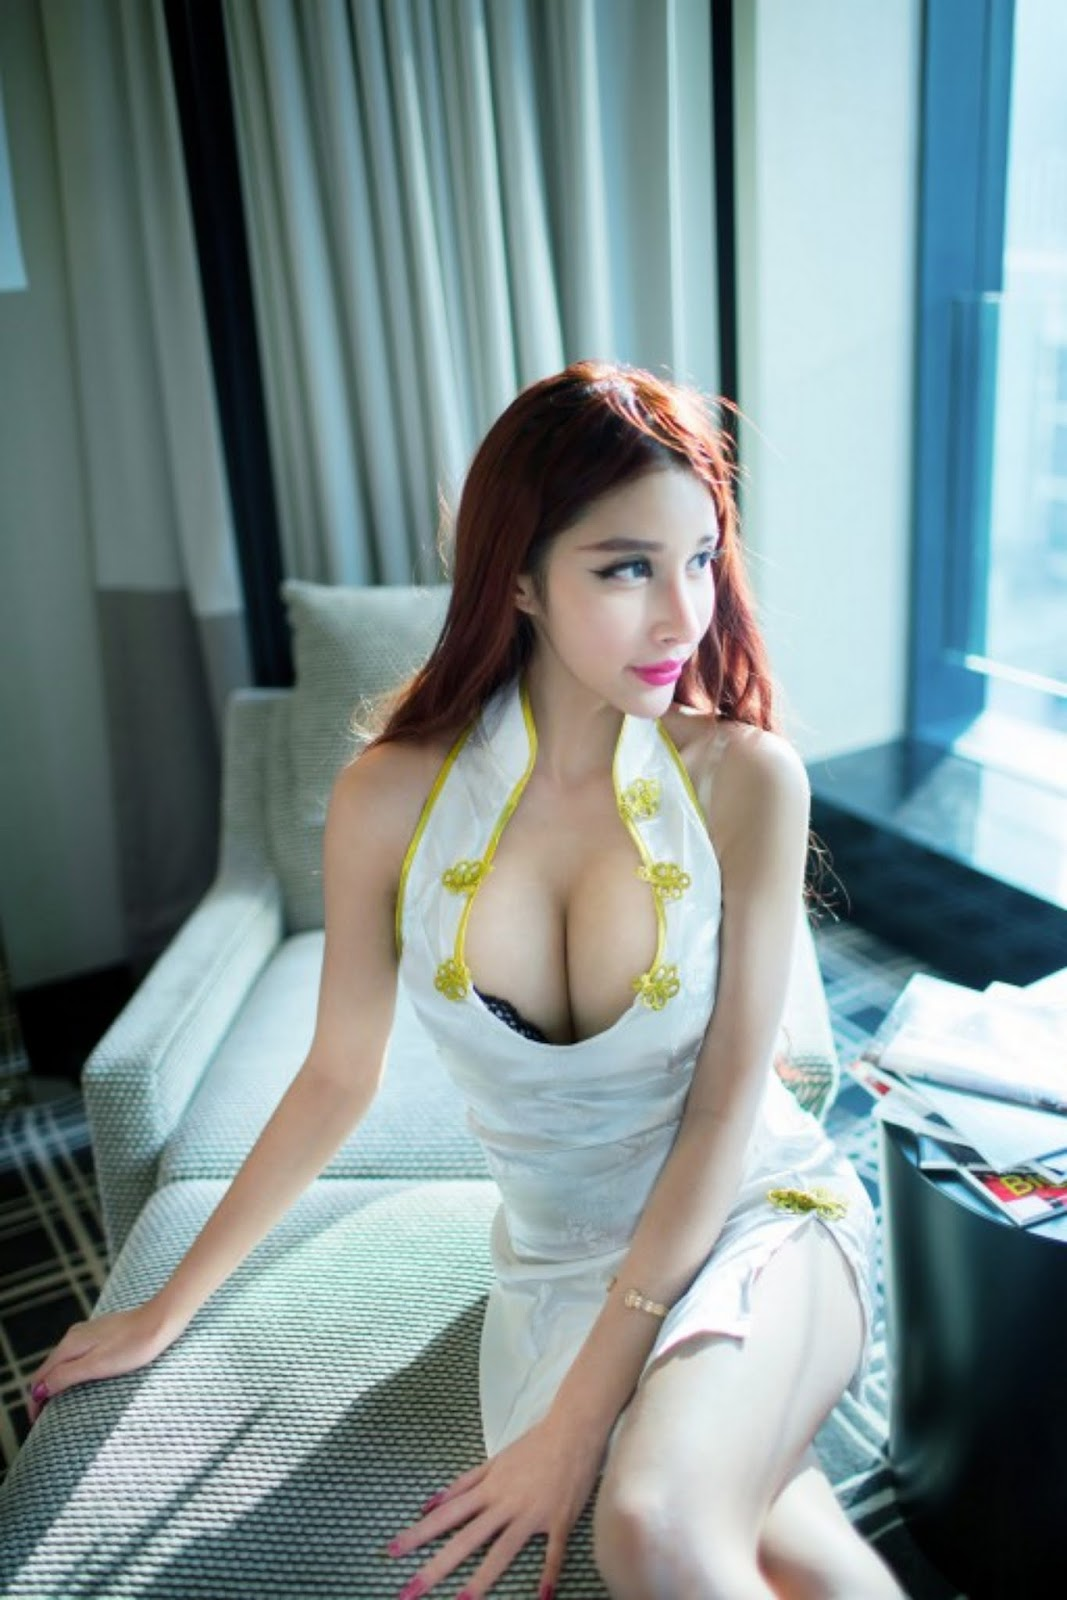 %25C2%25B1 %25C2%25B1 08 - Model Nude TUIGIRL NO.49 Beauty Body Tits